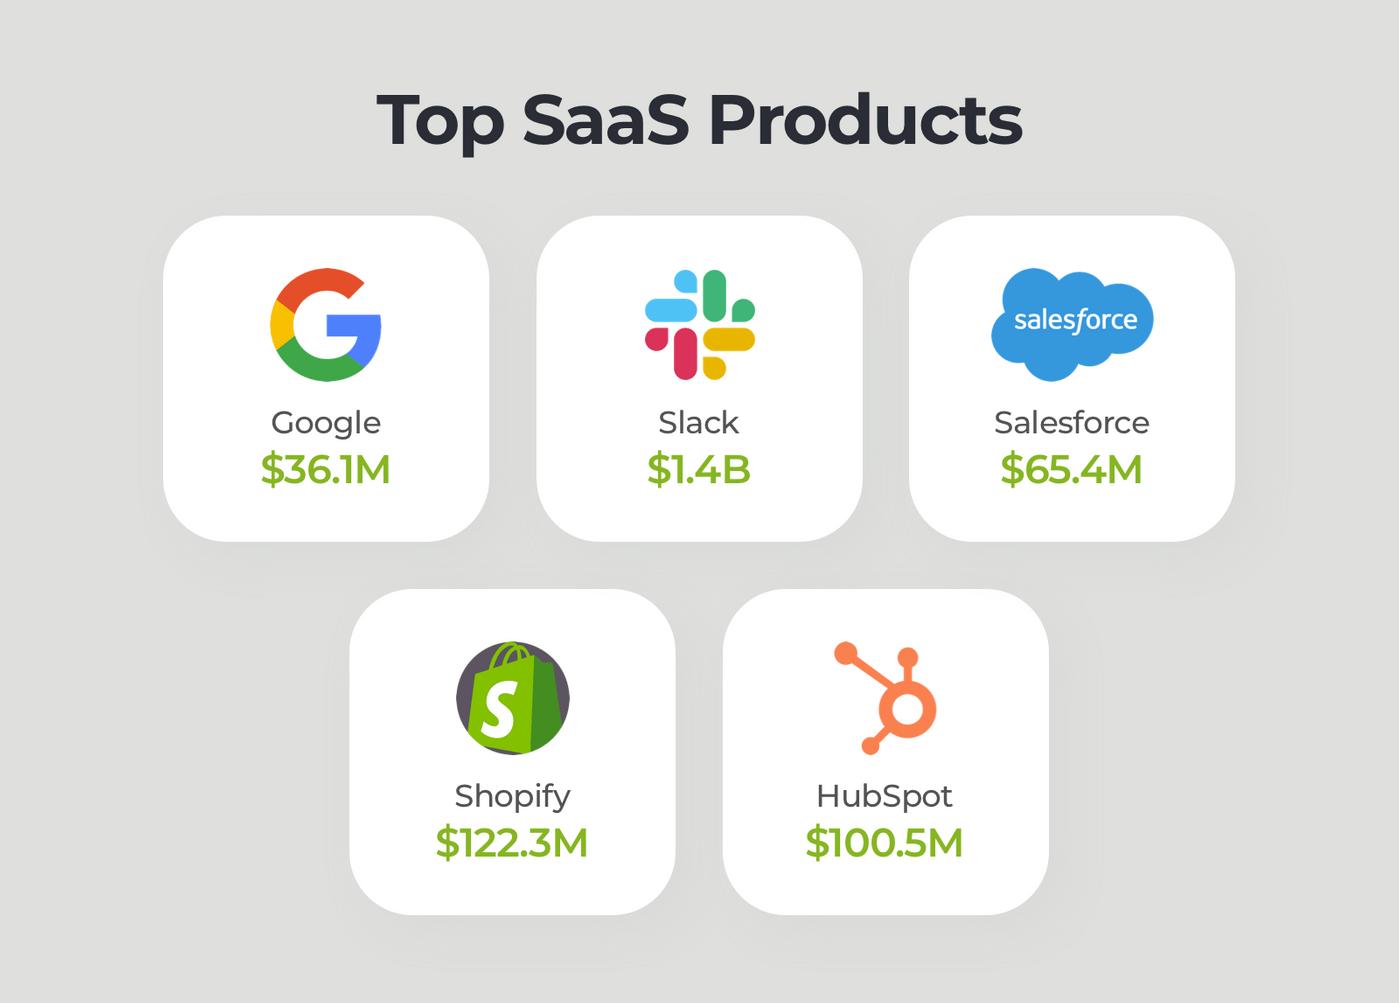 How to build a SaaS app: top SaaS providers